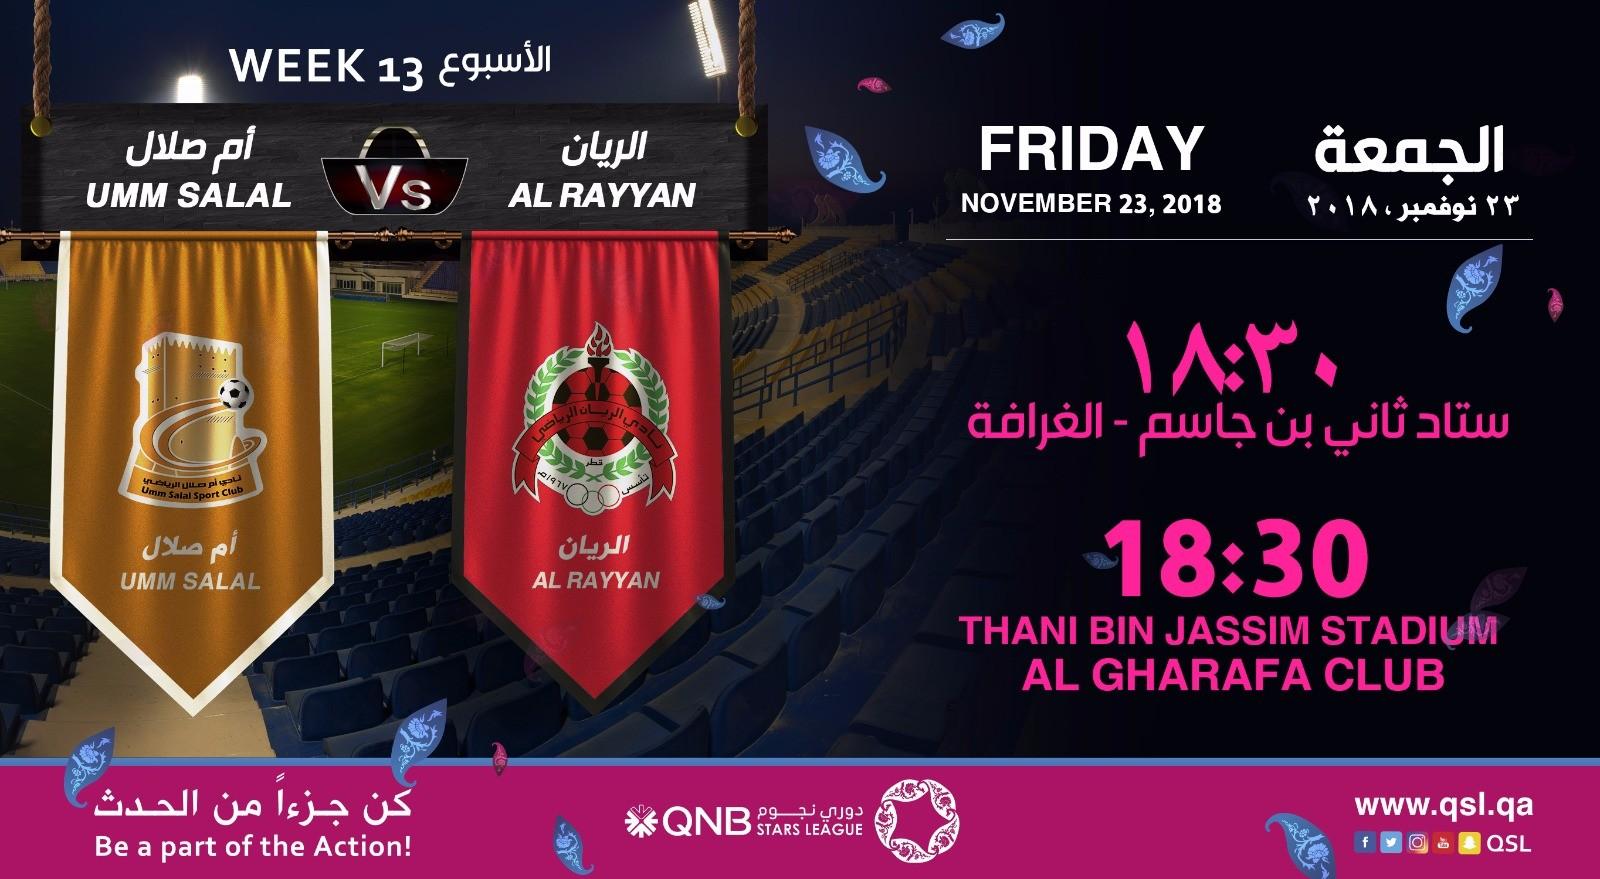 QNB Stars League Week 13 — Umm Salal vs Al Rayyan